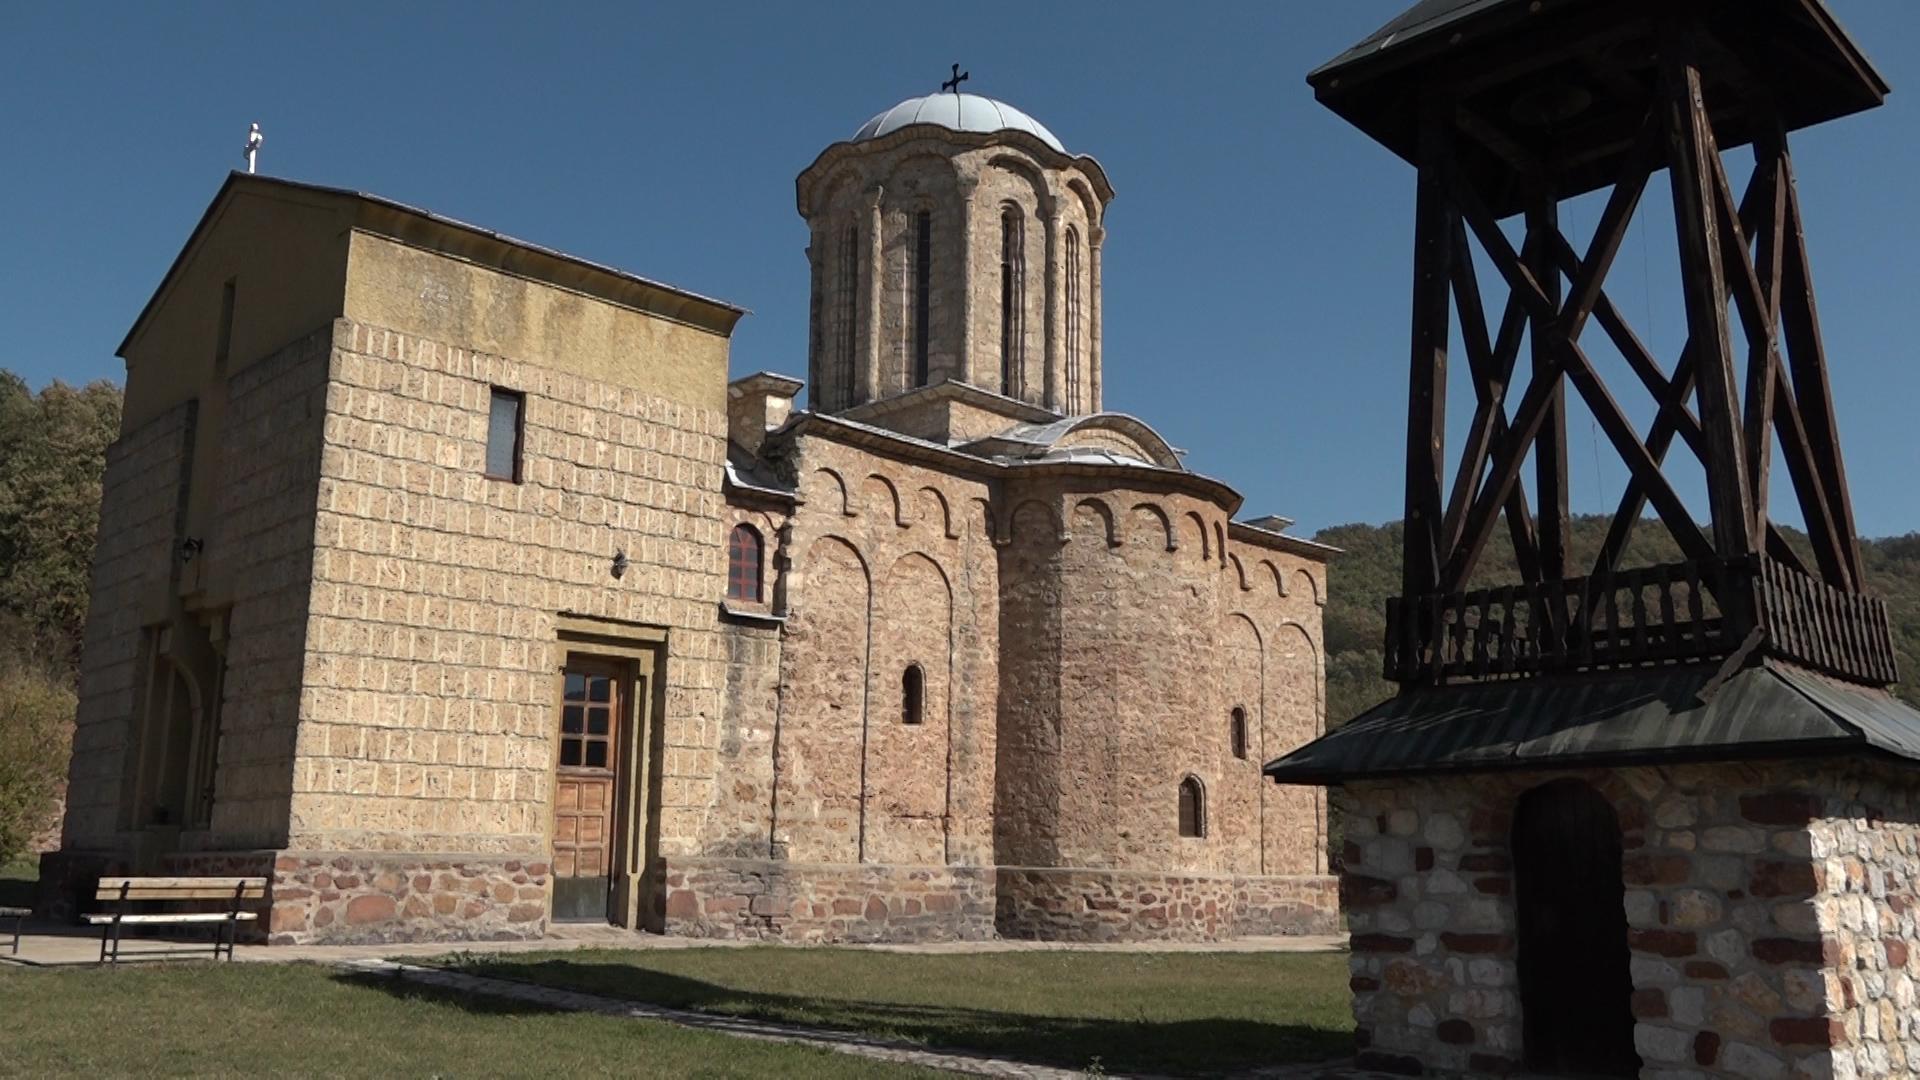 Čuda iz manastira Sisojevac u Sisevcu